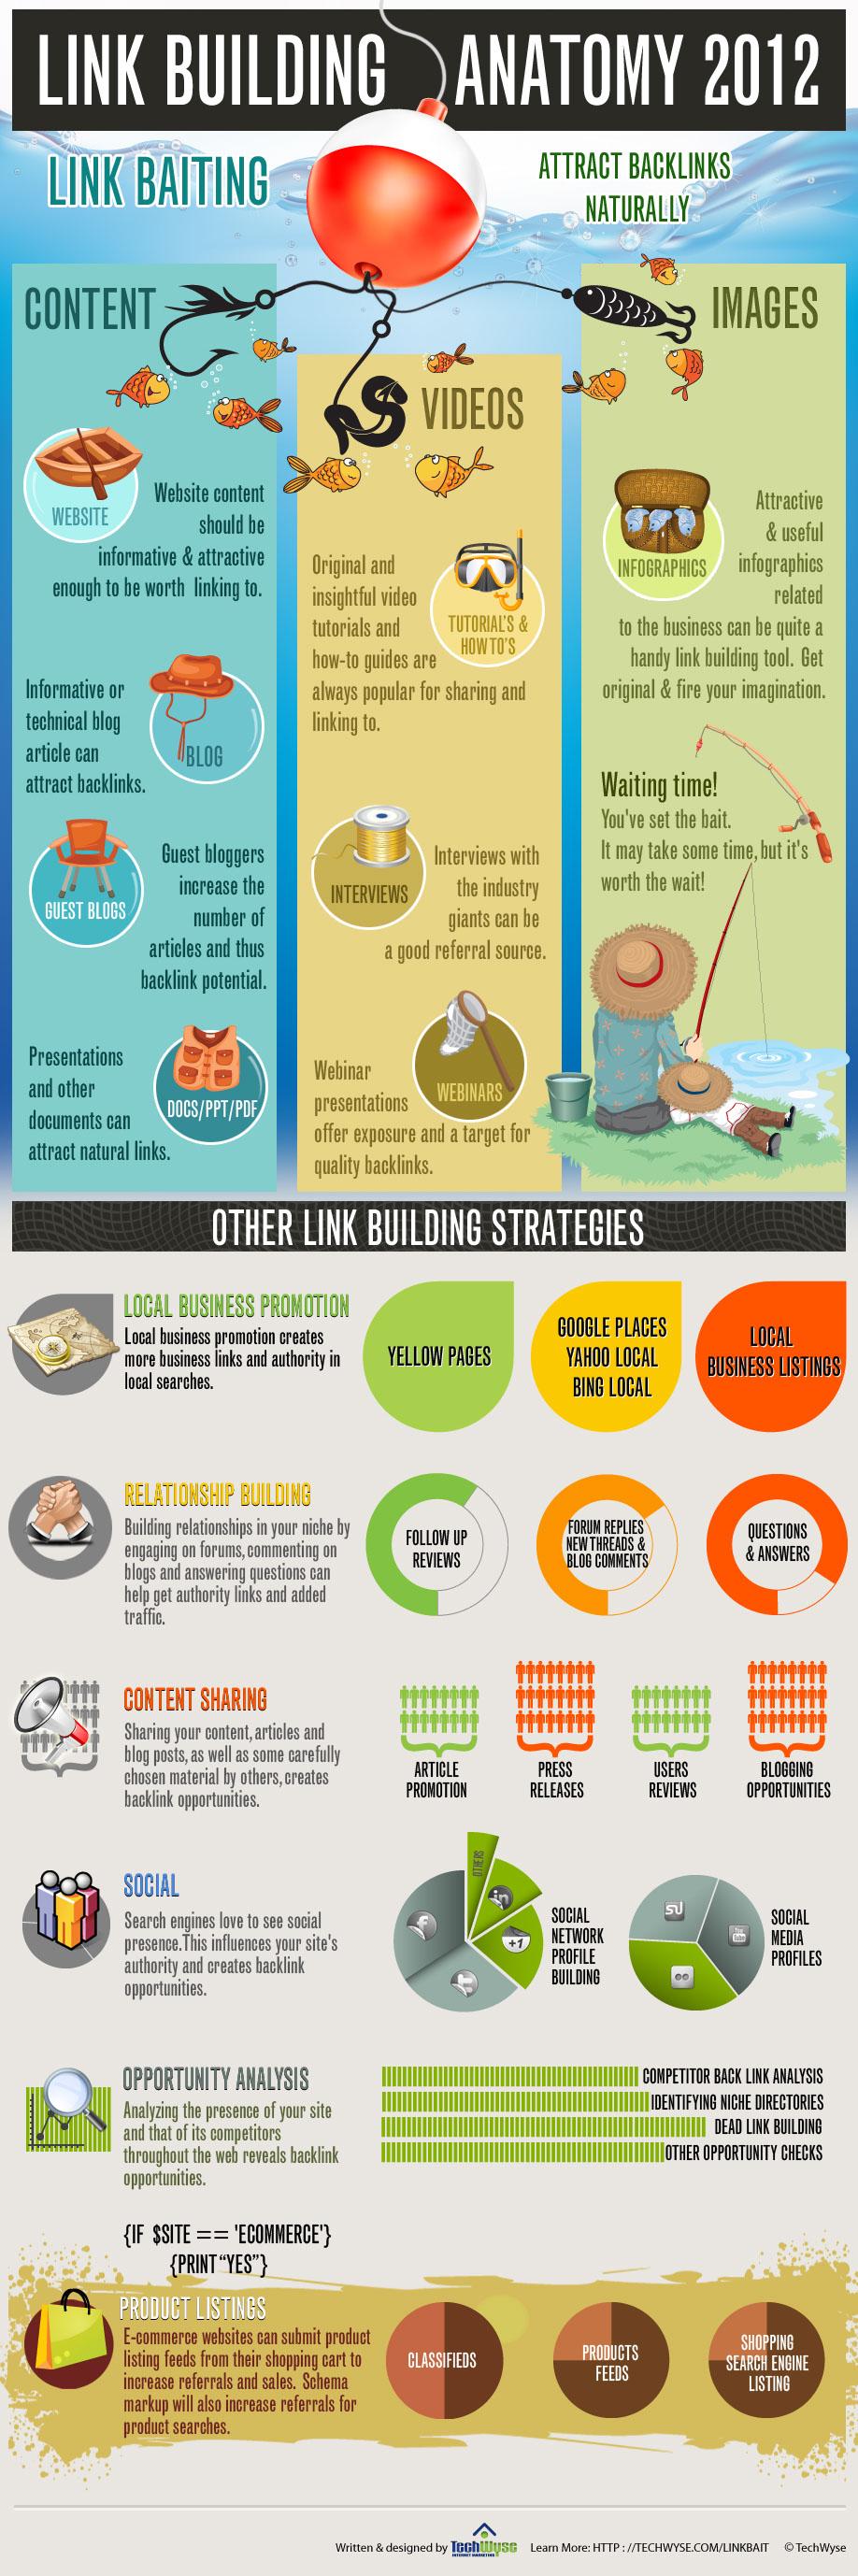 Link-Building-Anatomy-2012-infographic